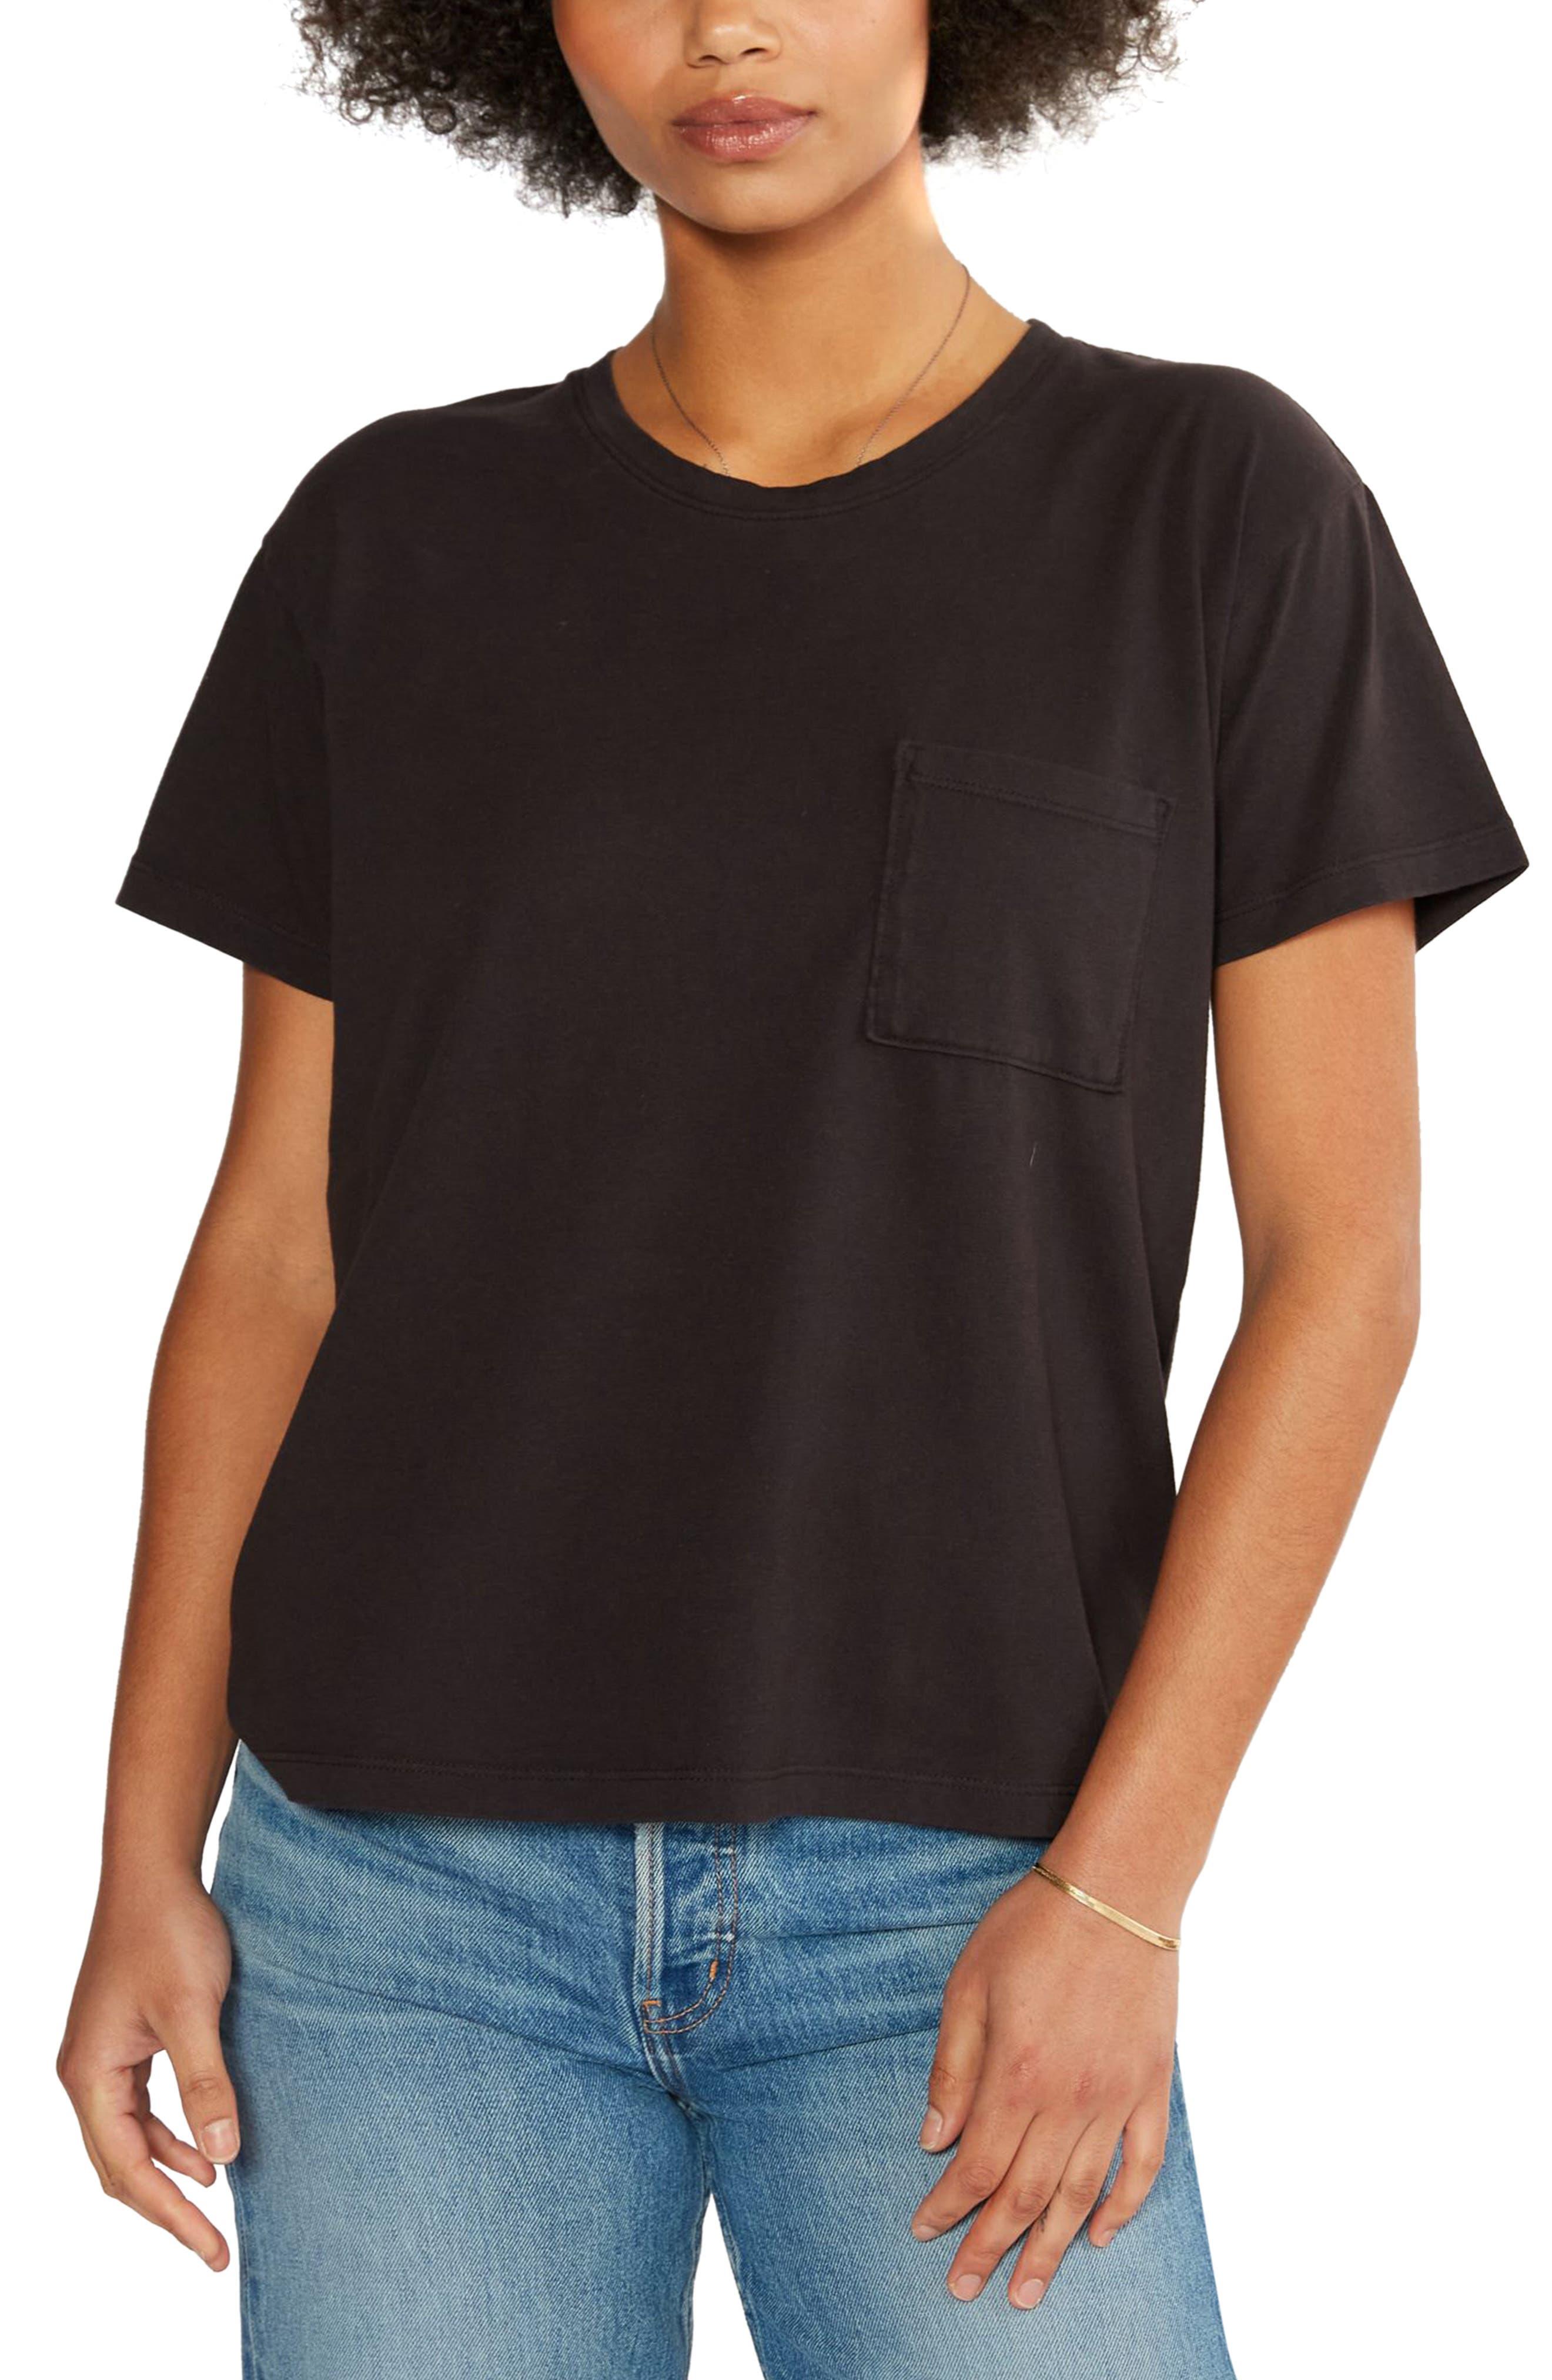 Women's Etica Avril Organic Cotton Pocket T-Shirt